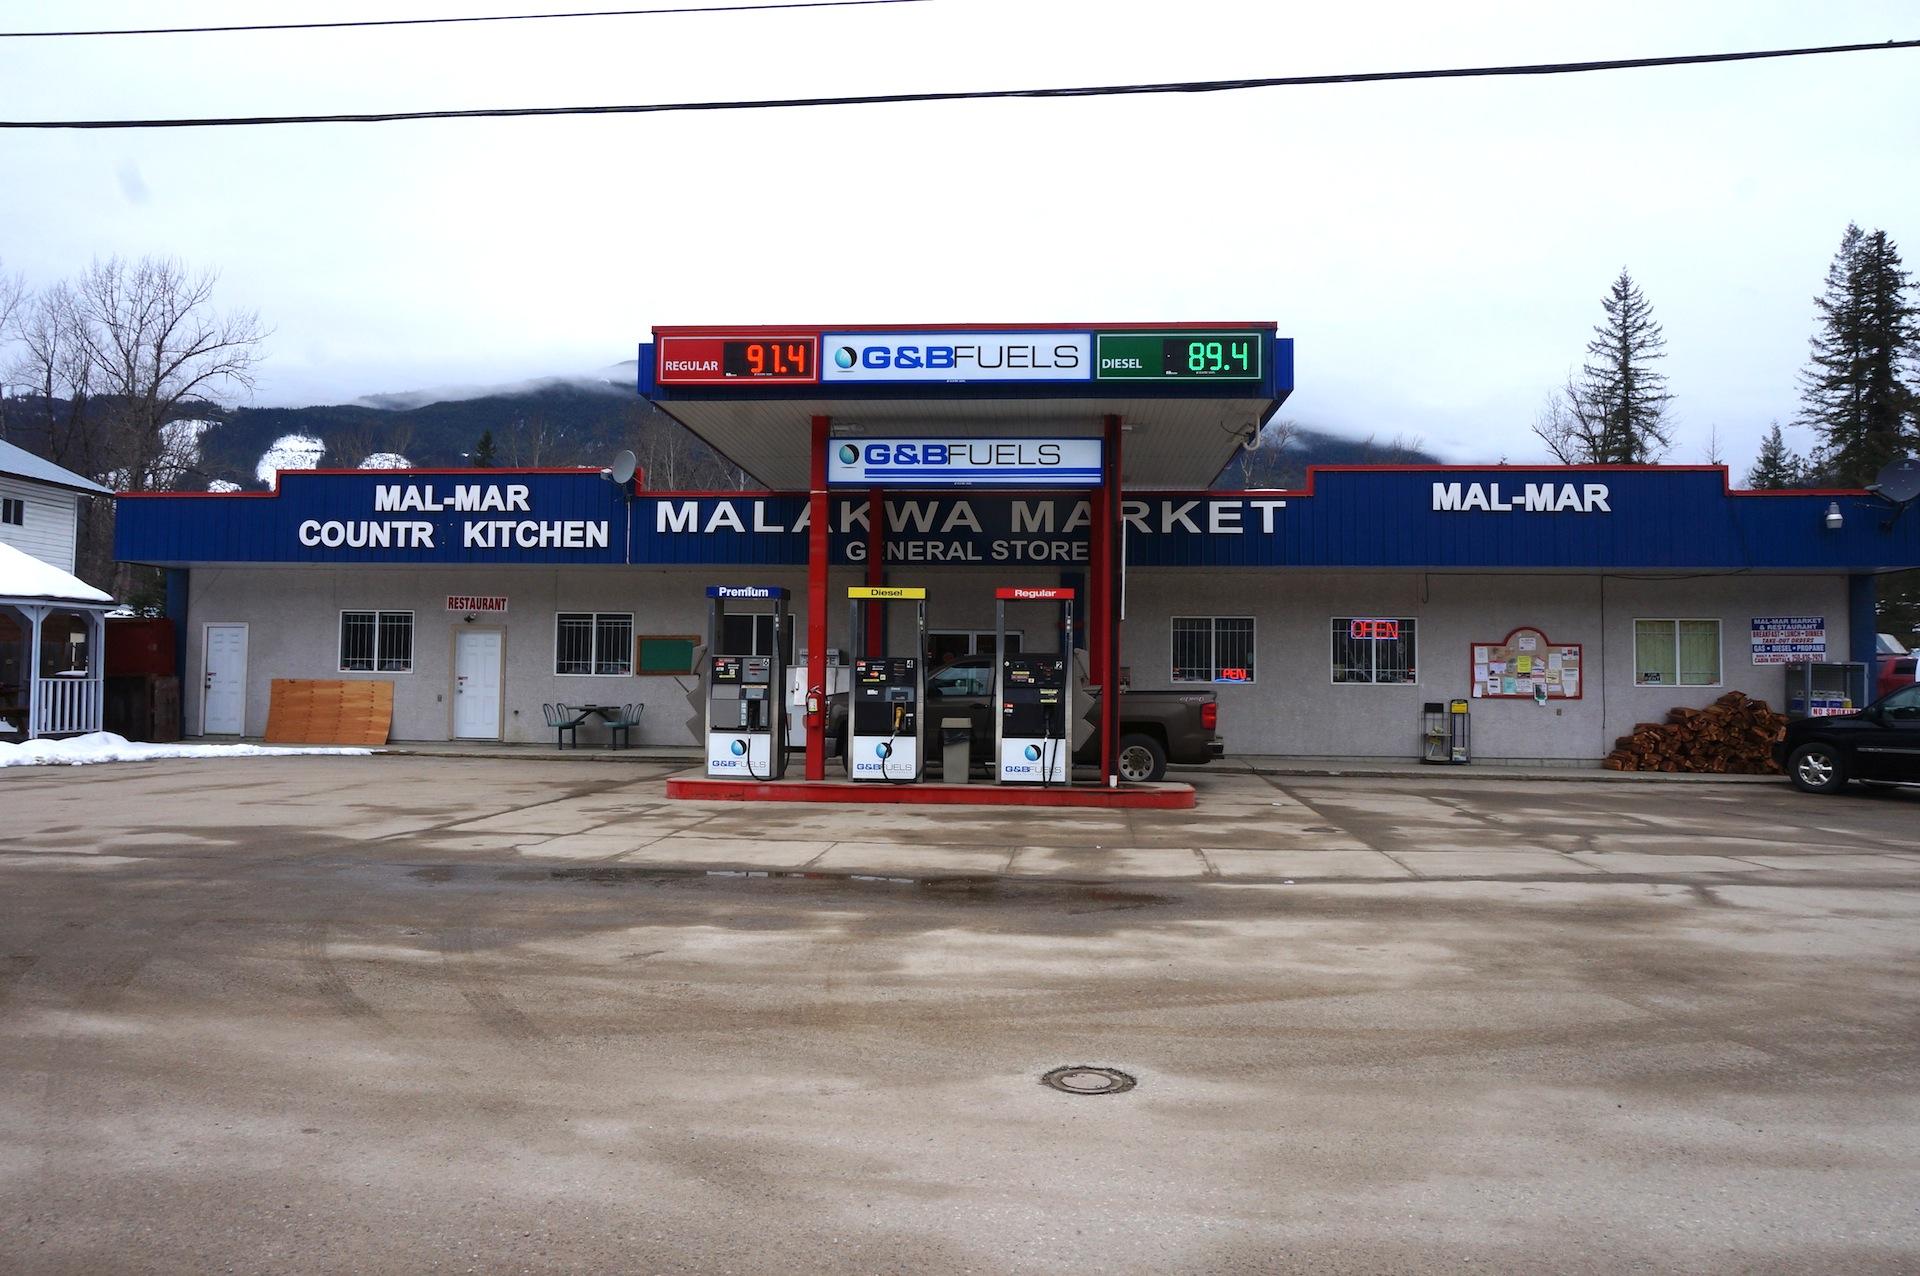 malmar malakwa